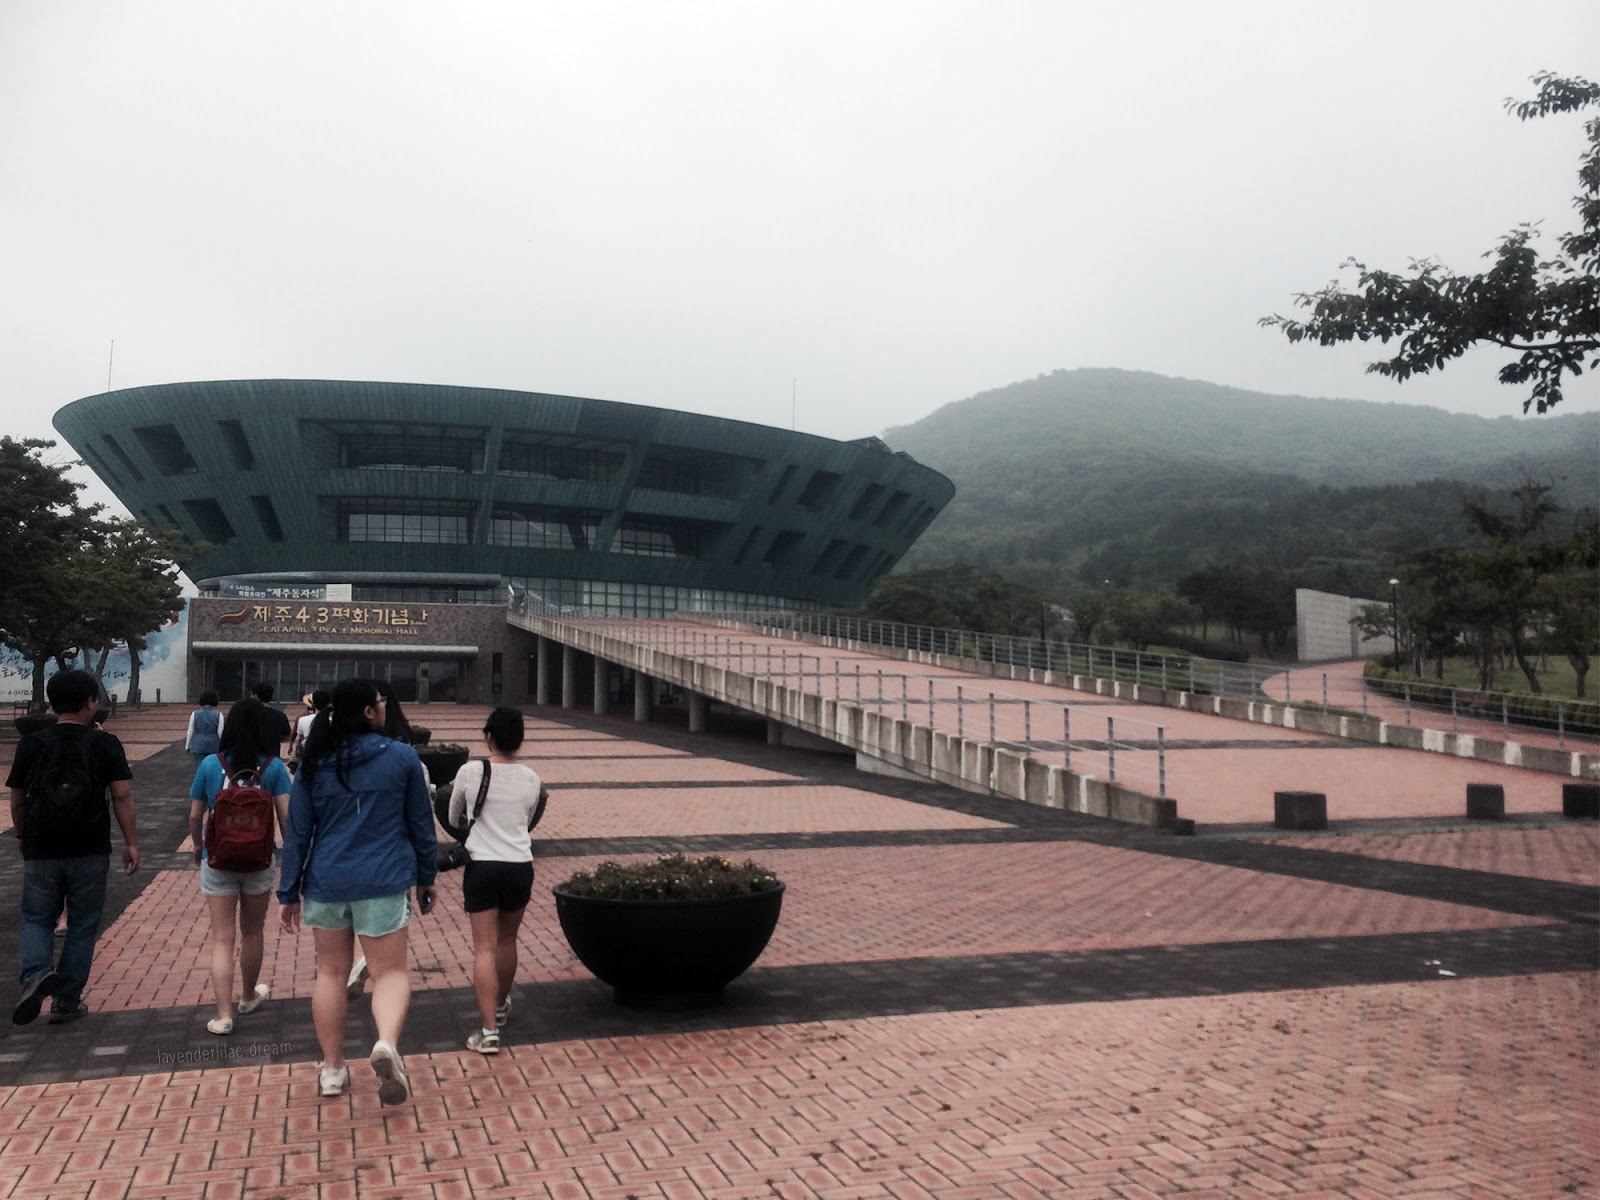 South Korea, Jeju Island, Yonsei University, YISS 2014, April 3 Peace Park entrance